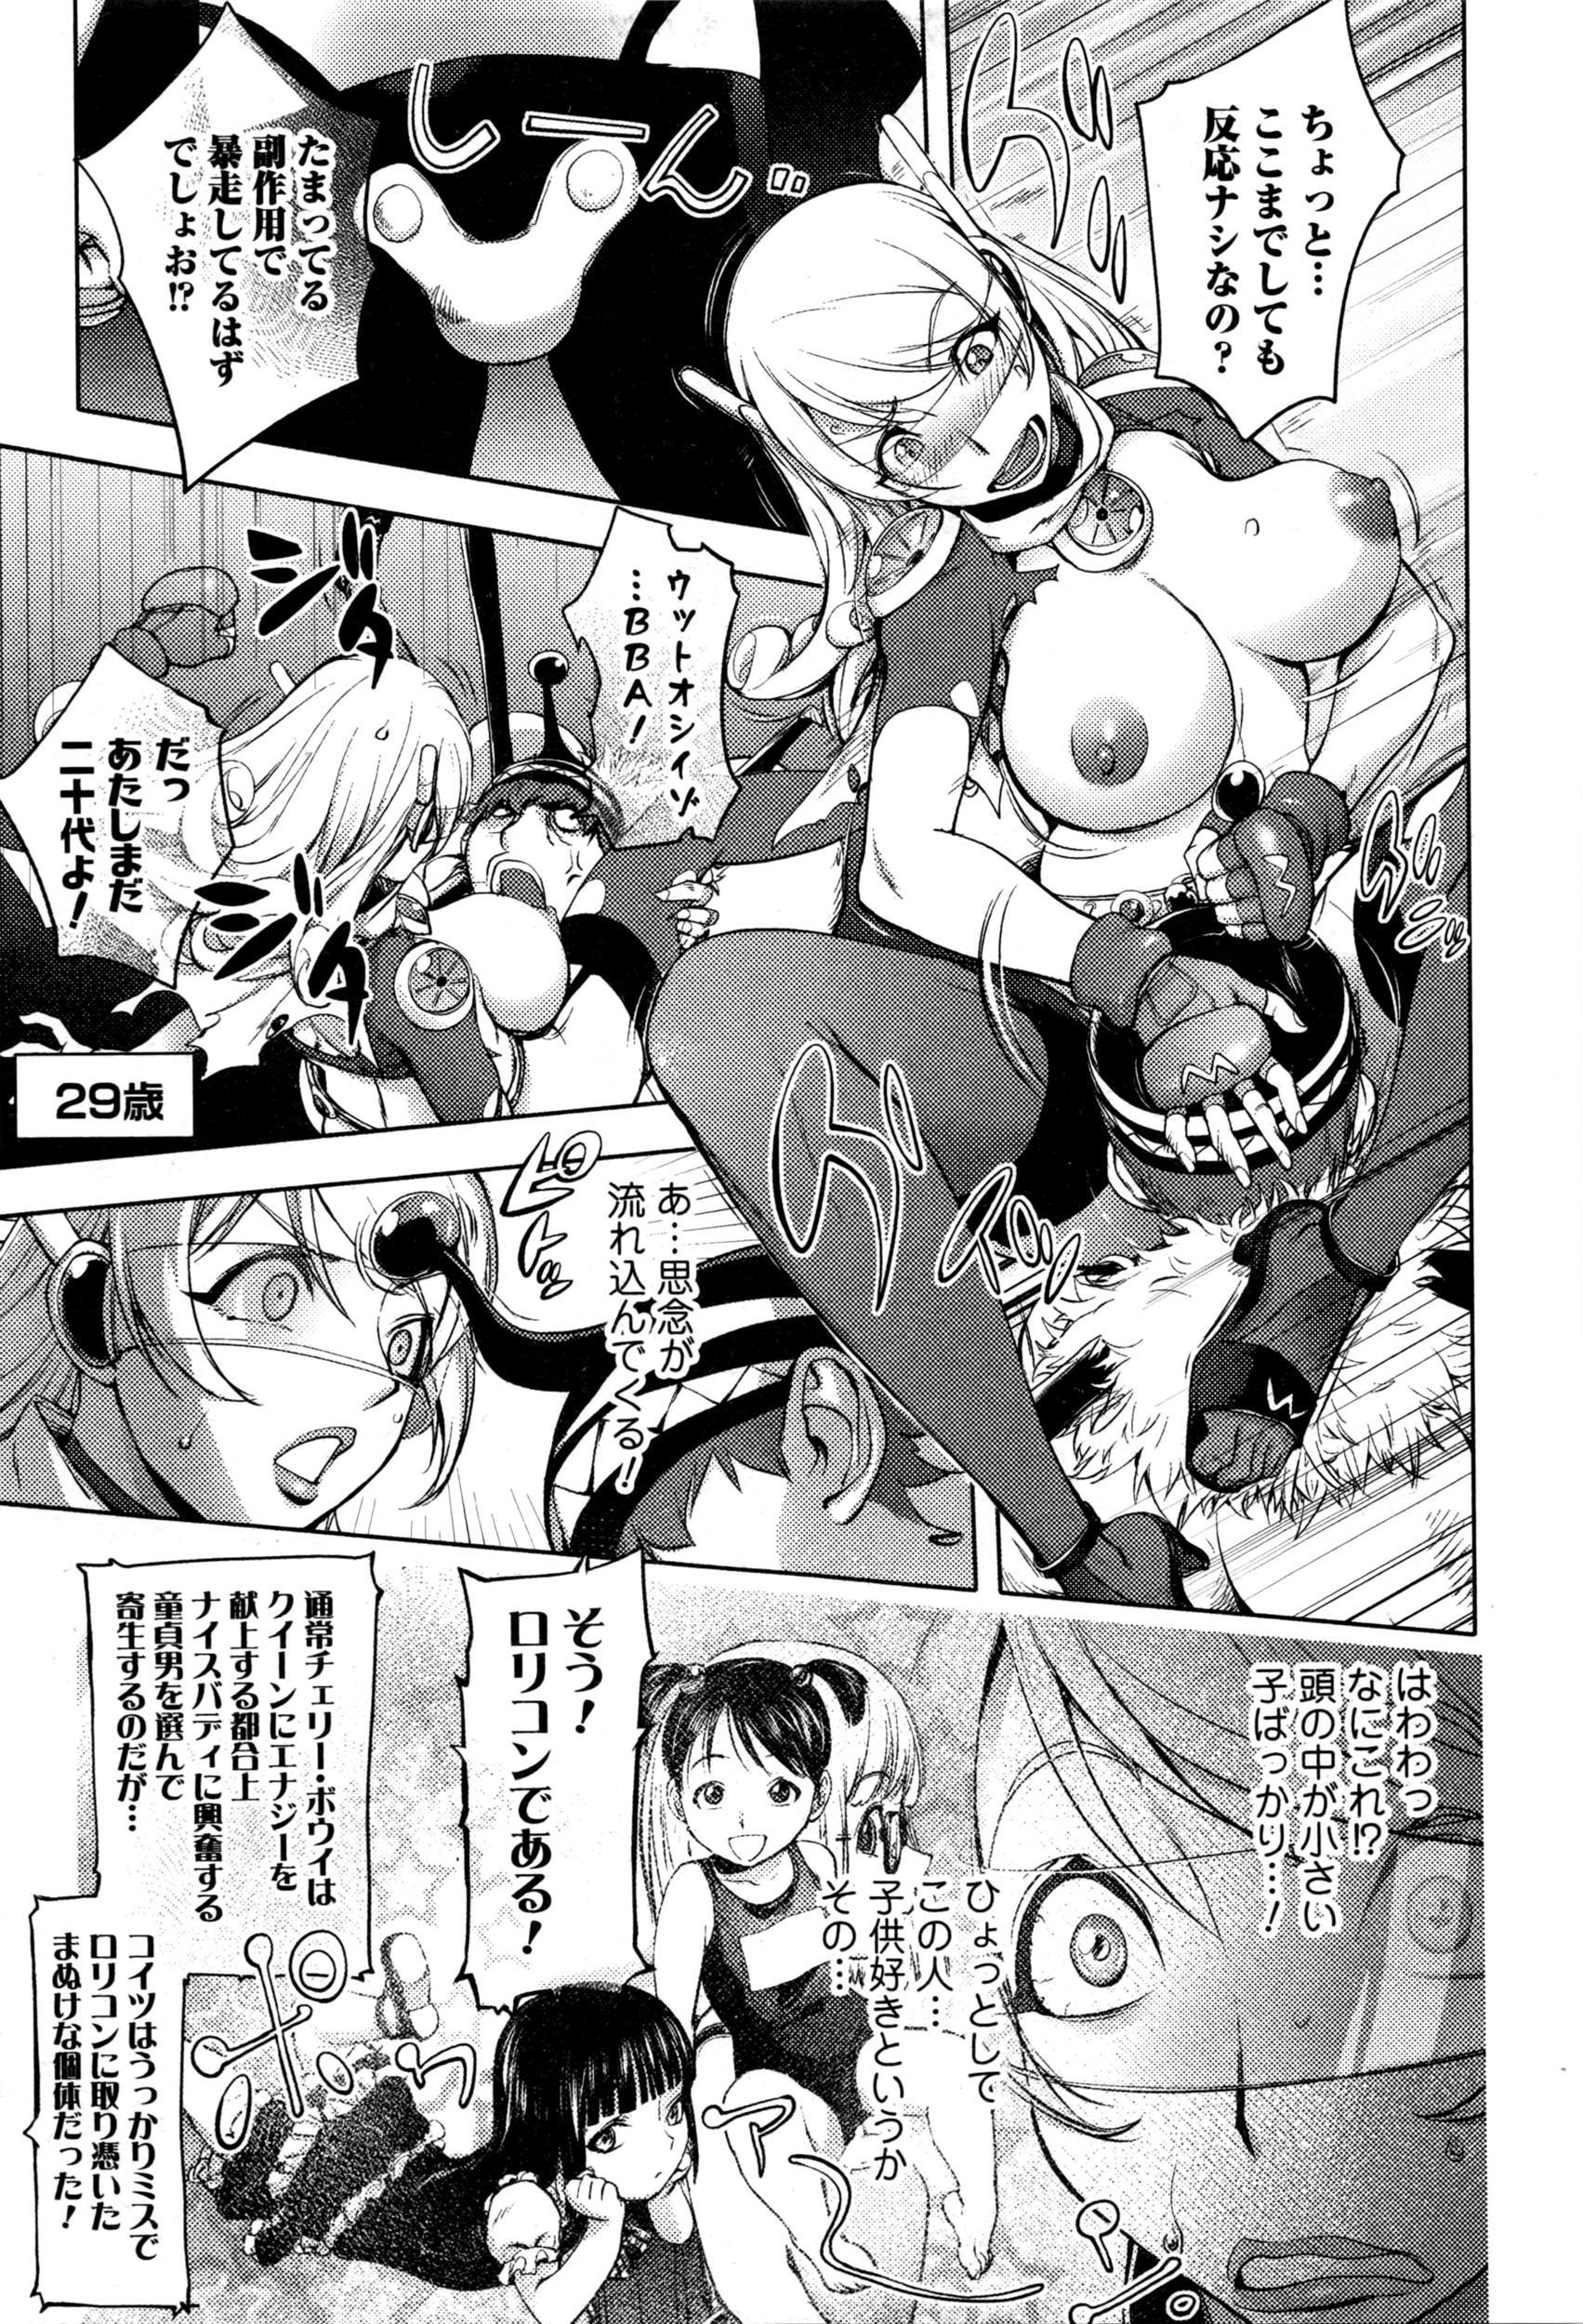 Comic JSCK Vol.3 2016-03 77